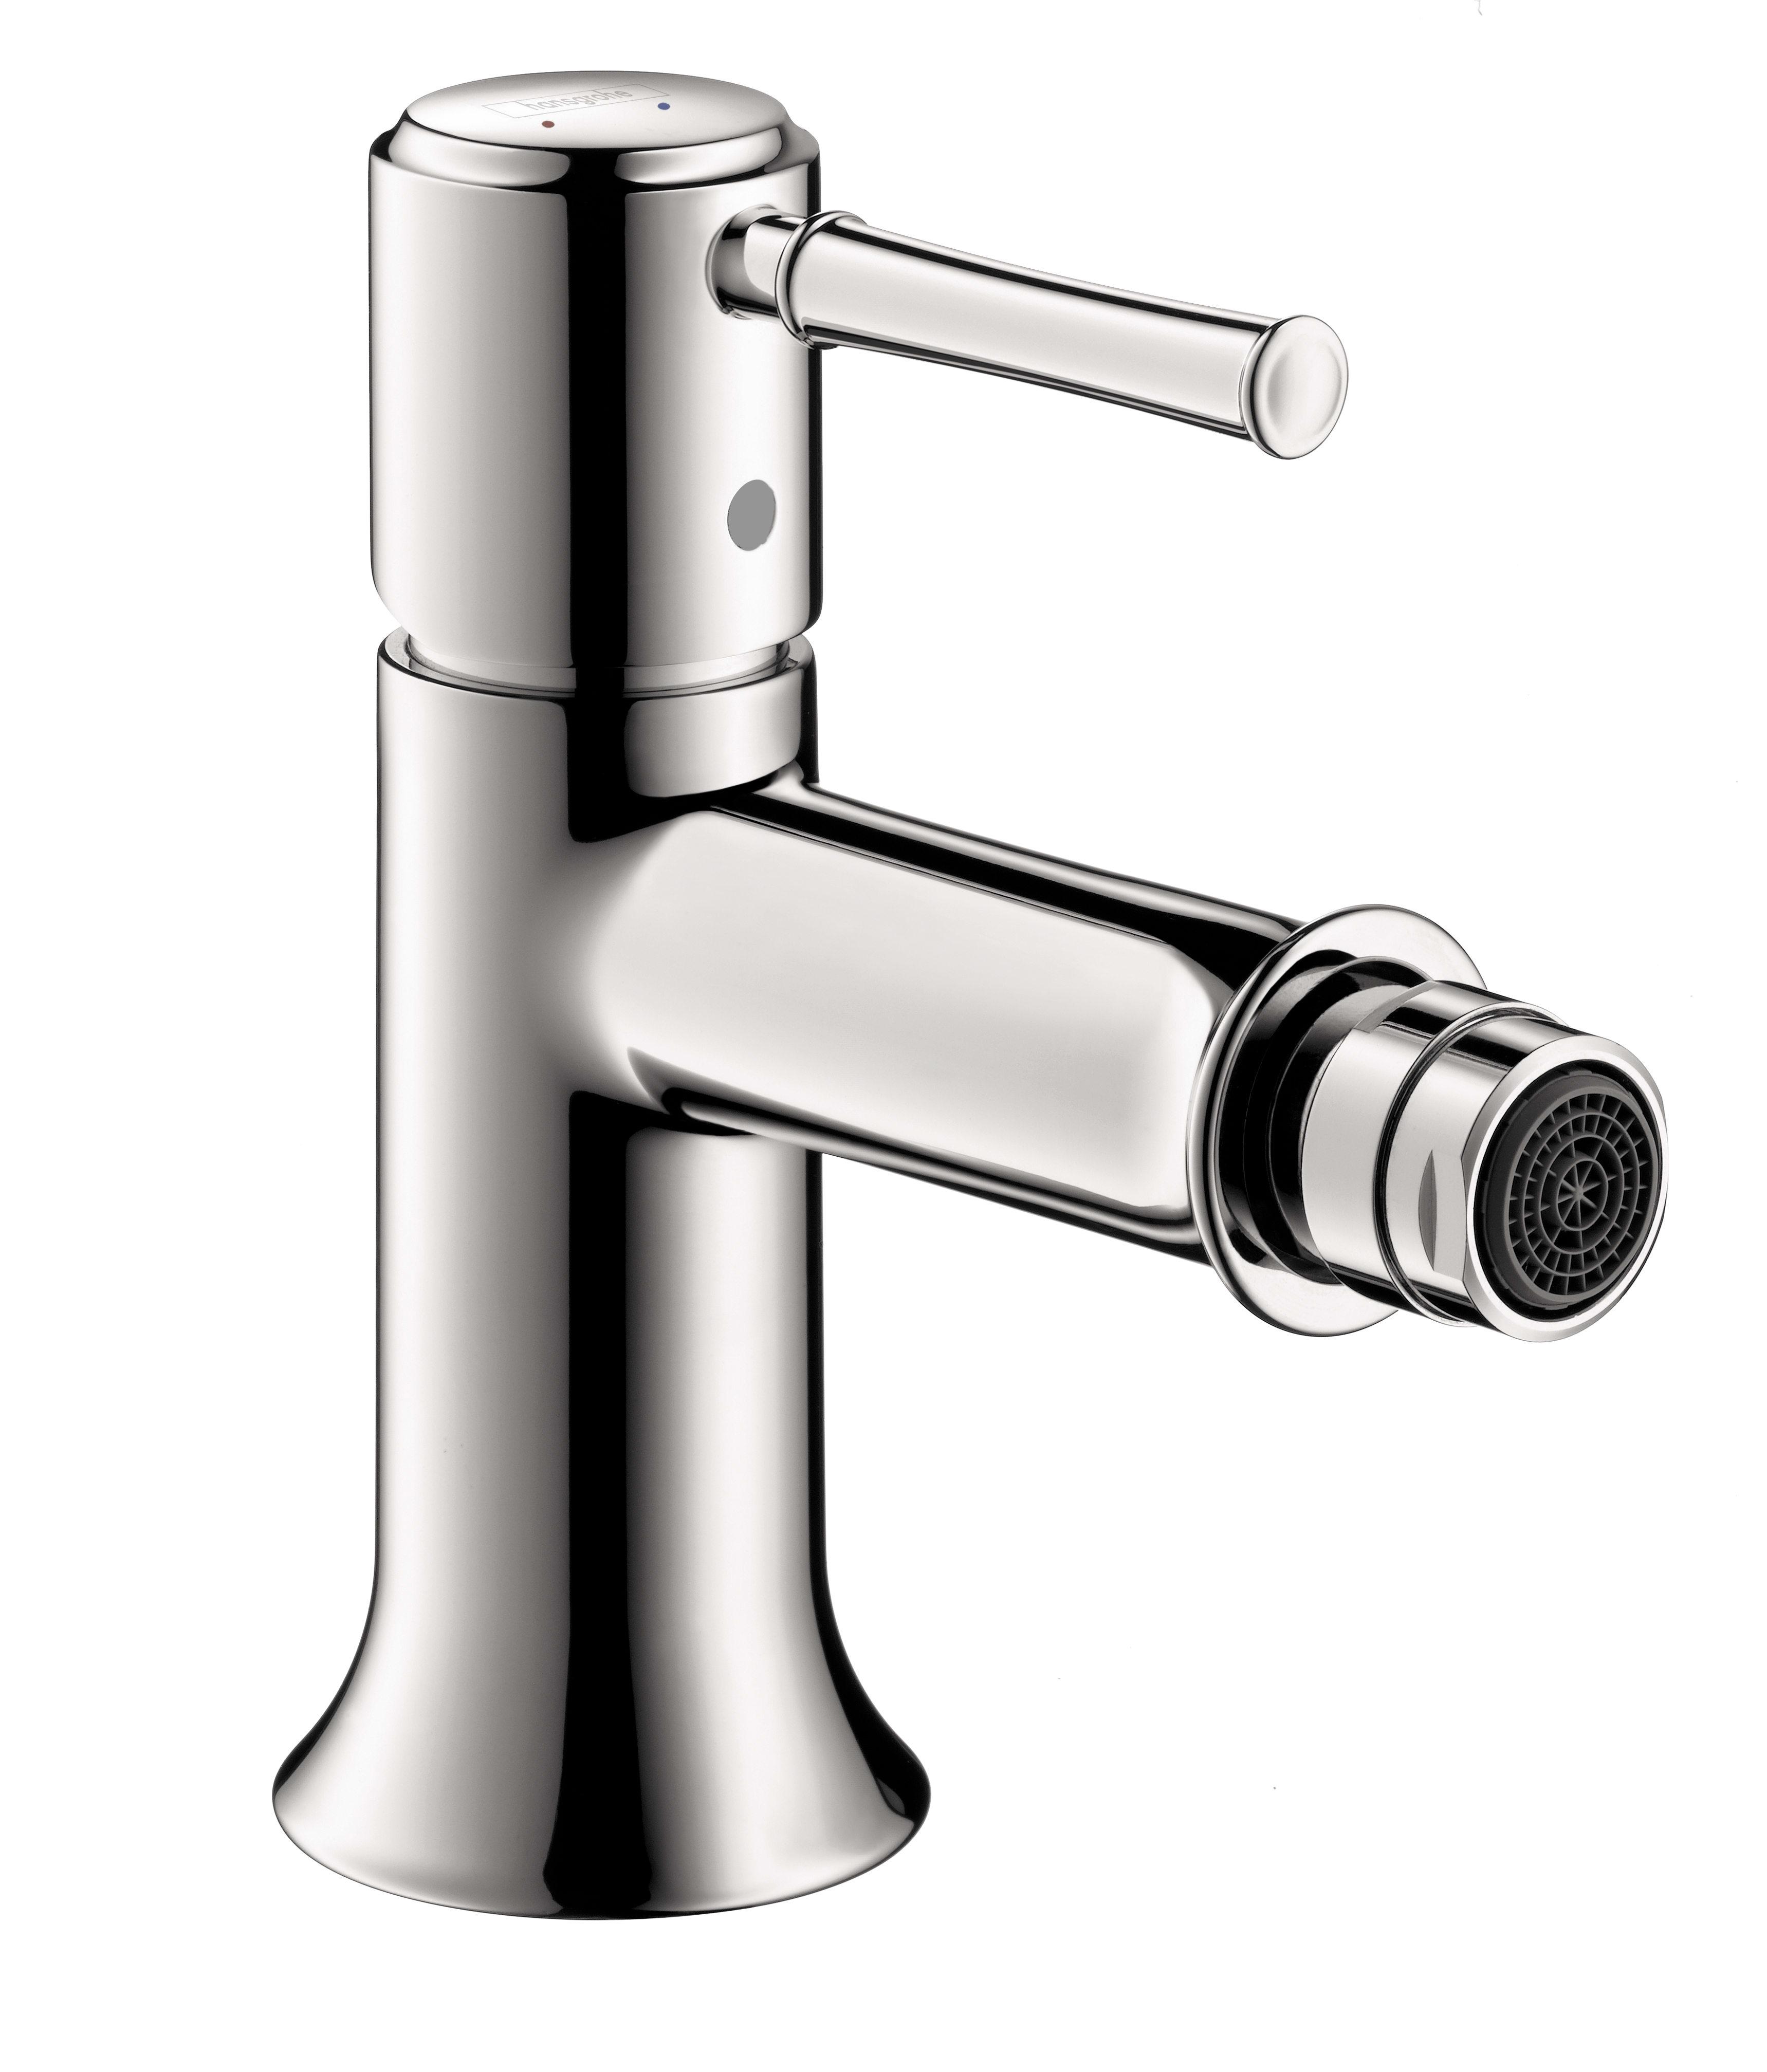 Hansgrohe 14120001 Chrome Talis C 2.2 GPM Bidet Faucet - Pop-Up ...